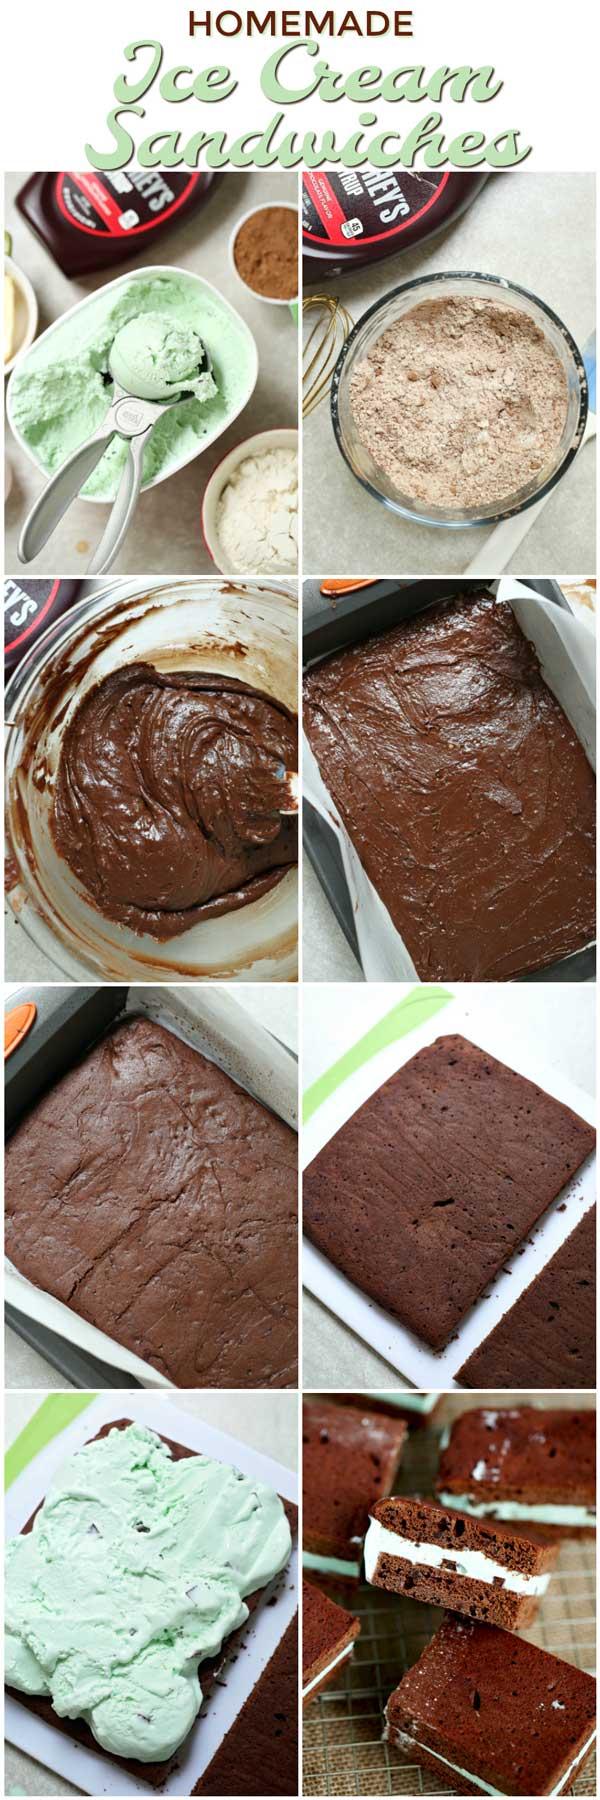 How to make Homemade Ice Cream Sandwich recipe